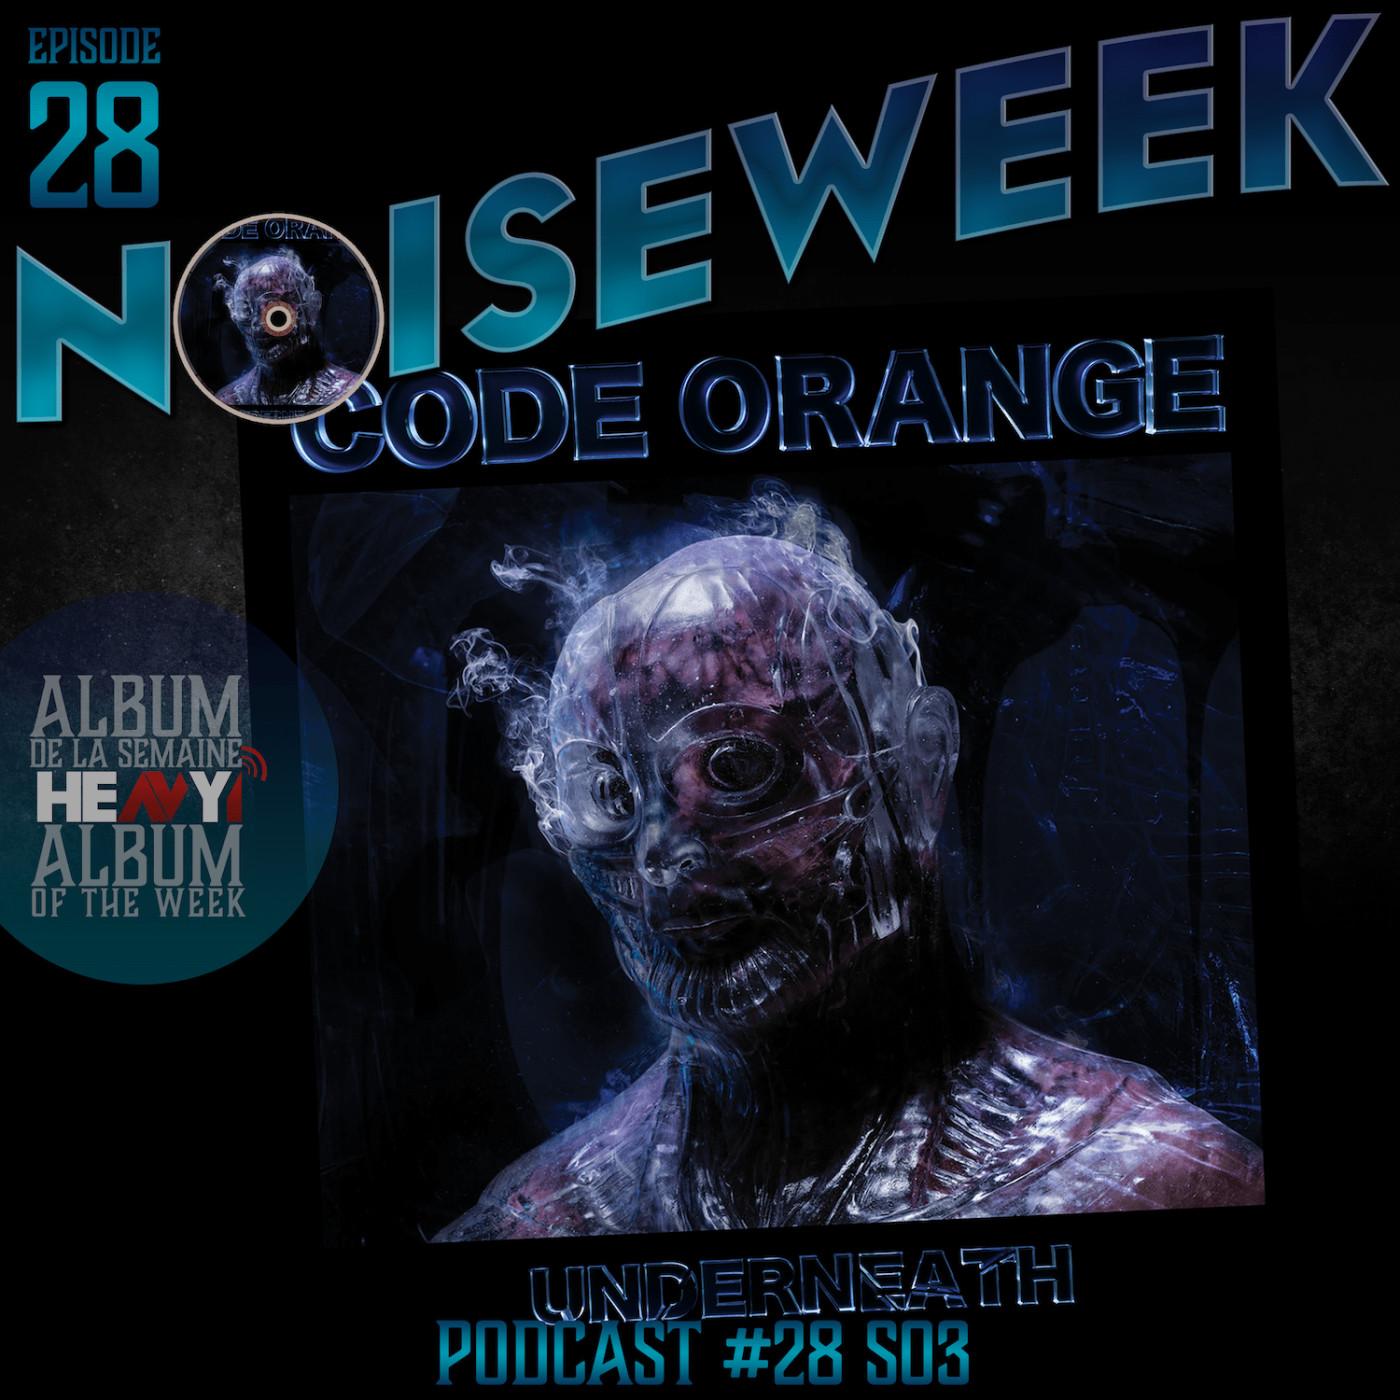 Noiseweek #28 Saison 3